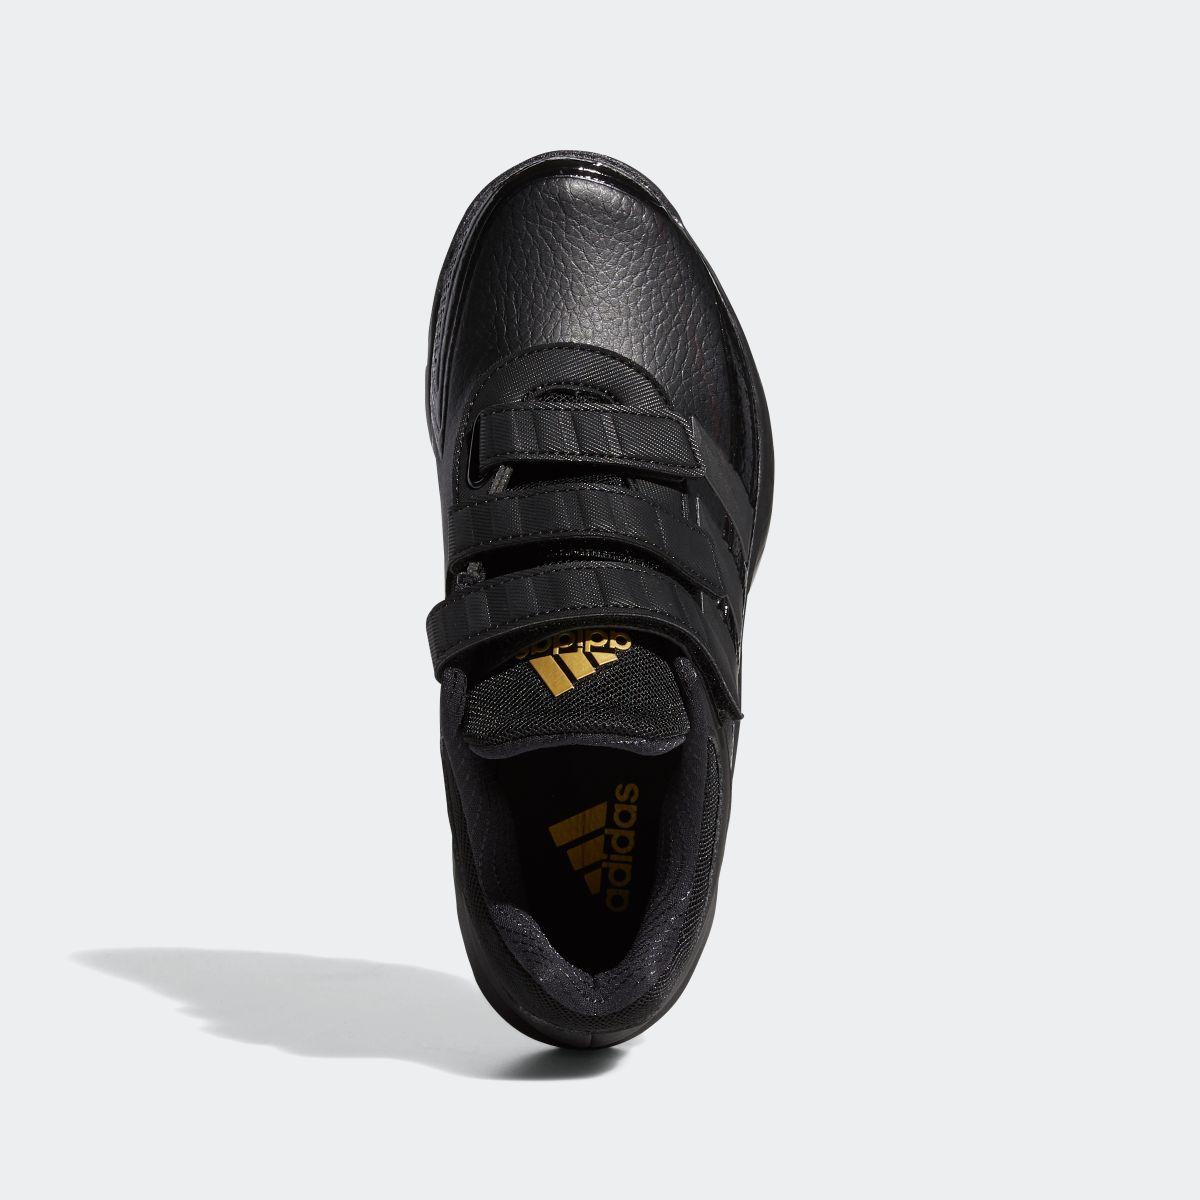 adidas(アディダス)『TRAINERトレーナーAC50(EG3616)』